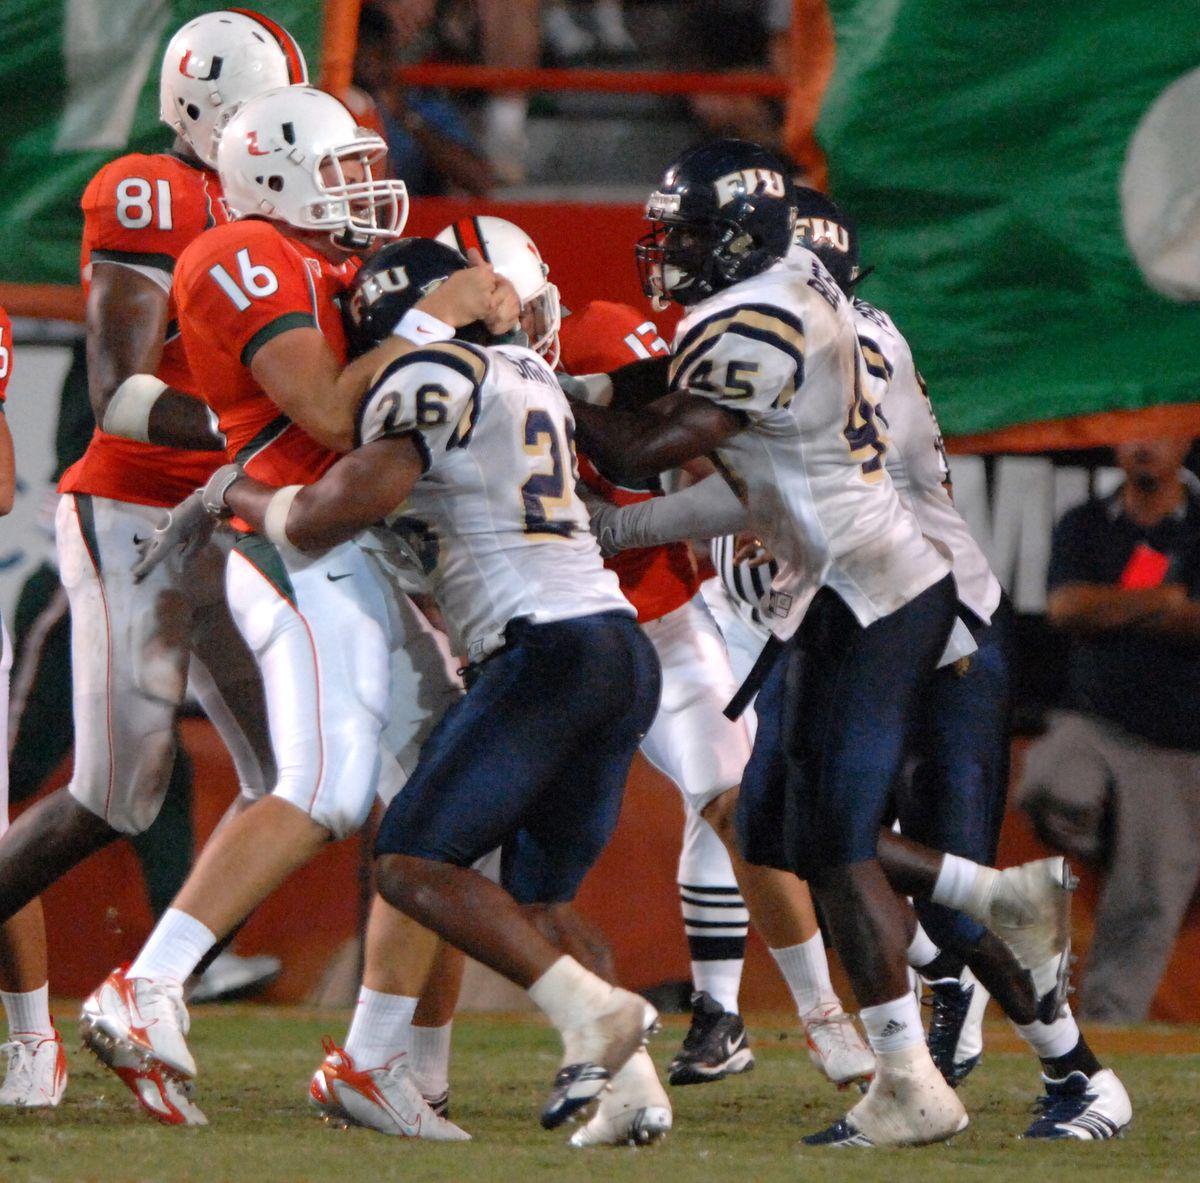 Football - NCAA - Miami vs. Florida International University